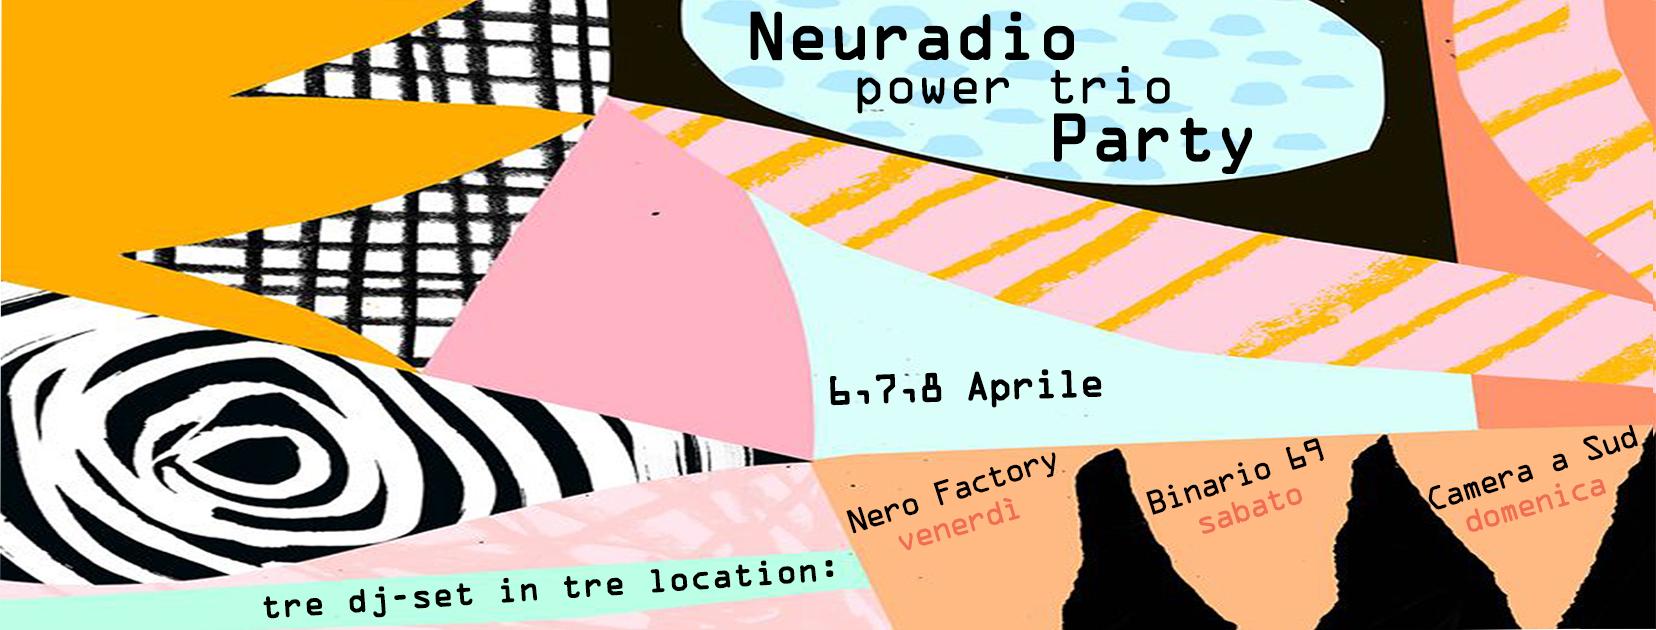 NEU RADIO Power Trio Party!